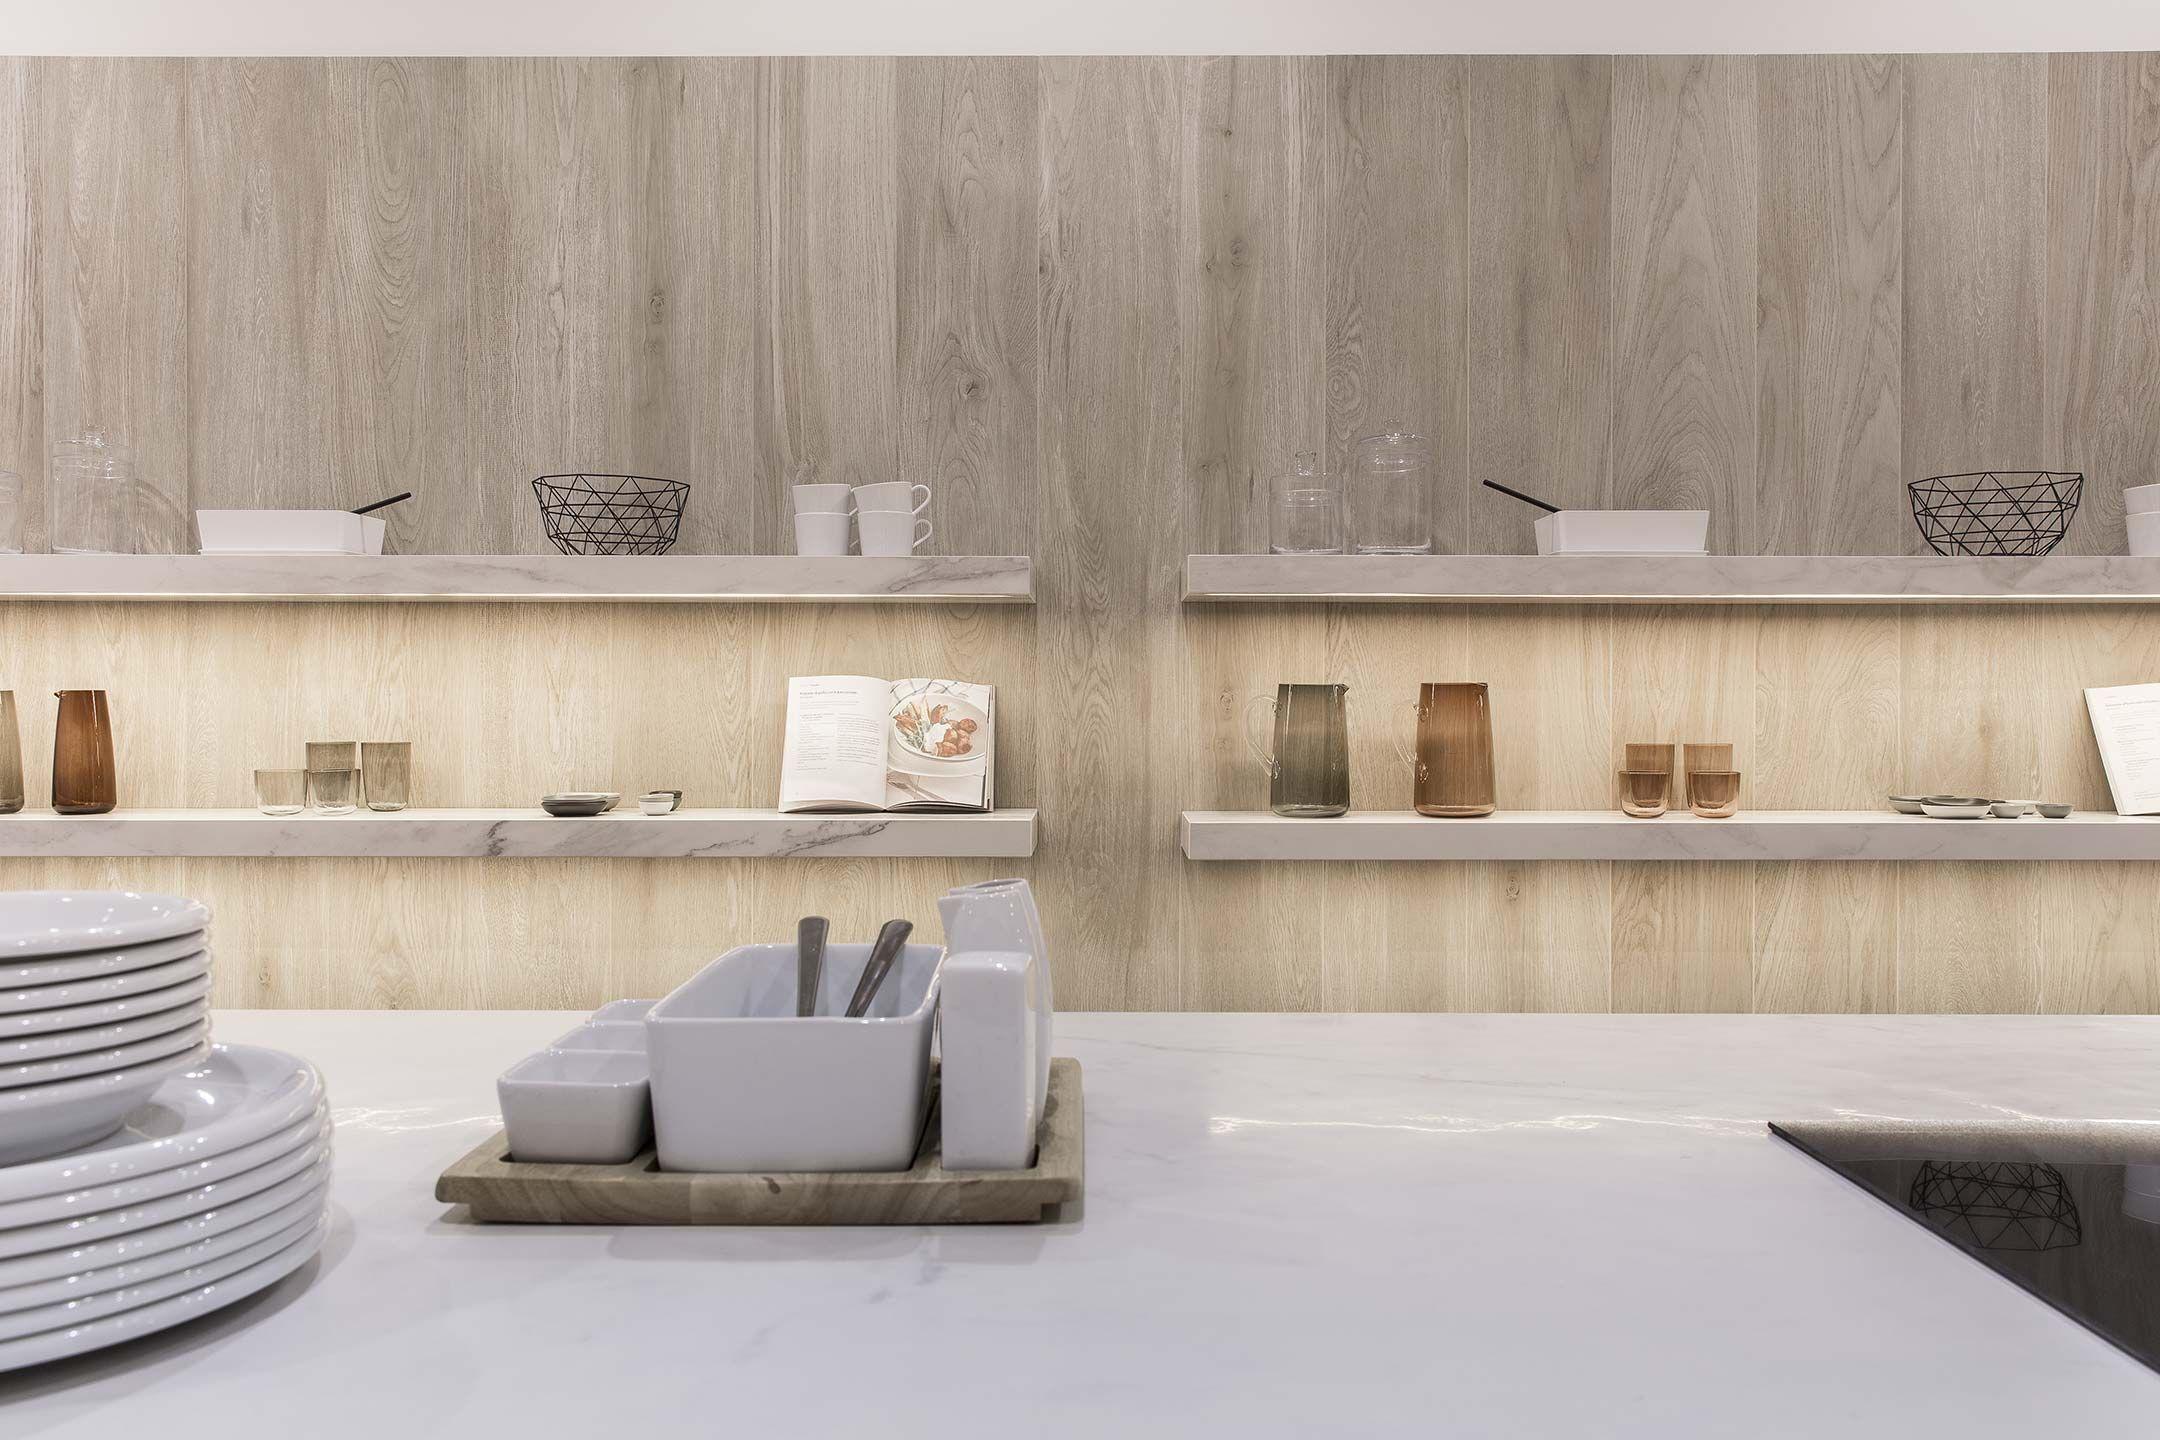 Florim gallery piastrelle cucina bagno soggiorno camera: gallery